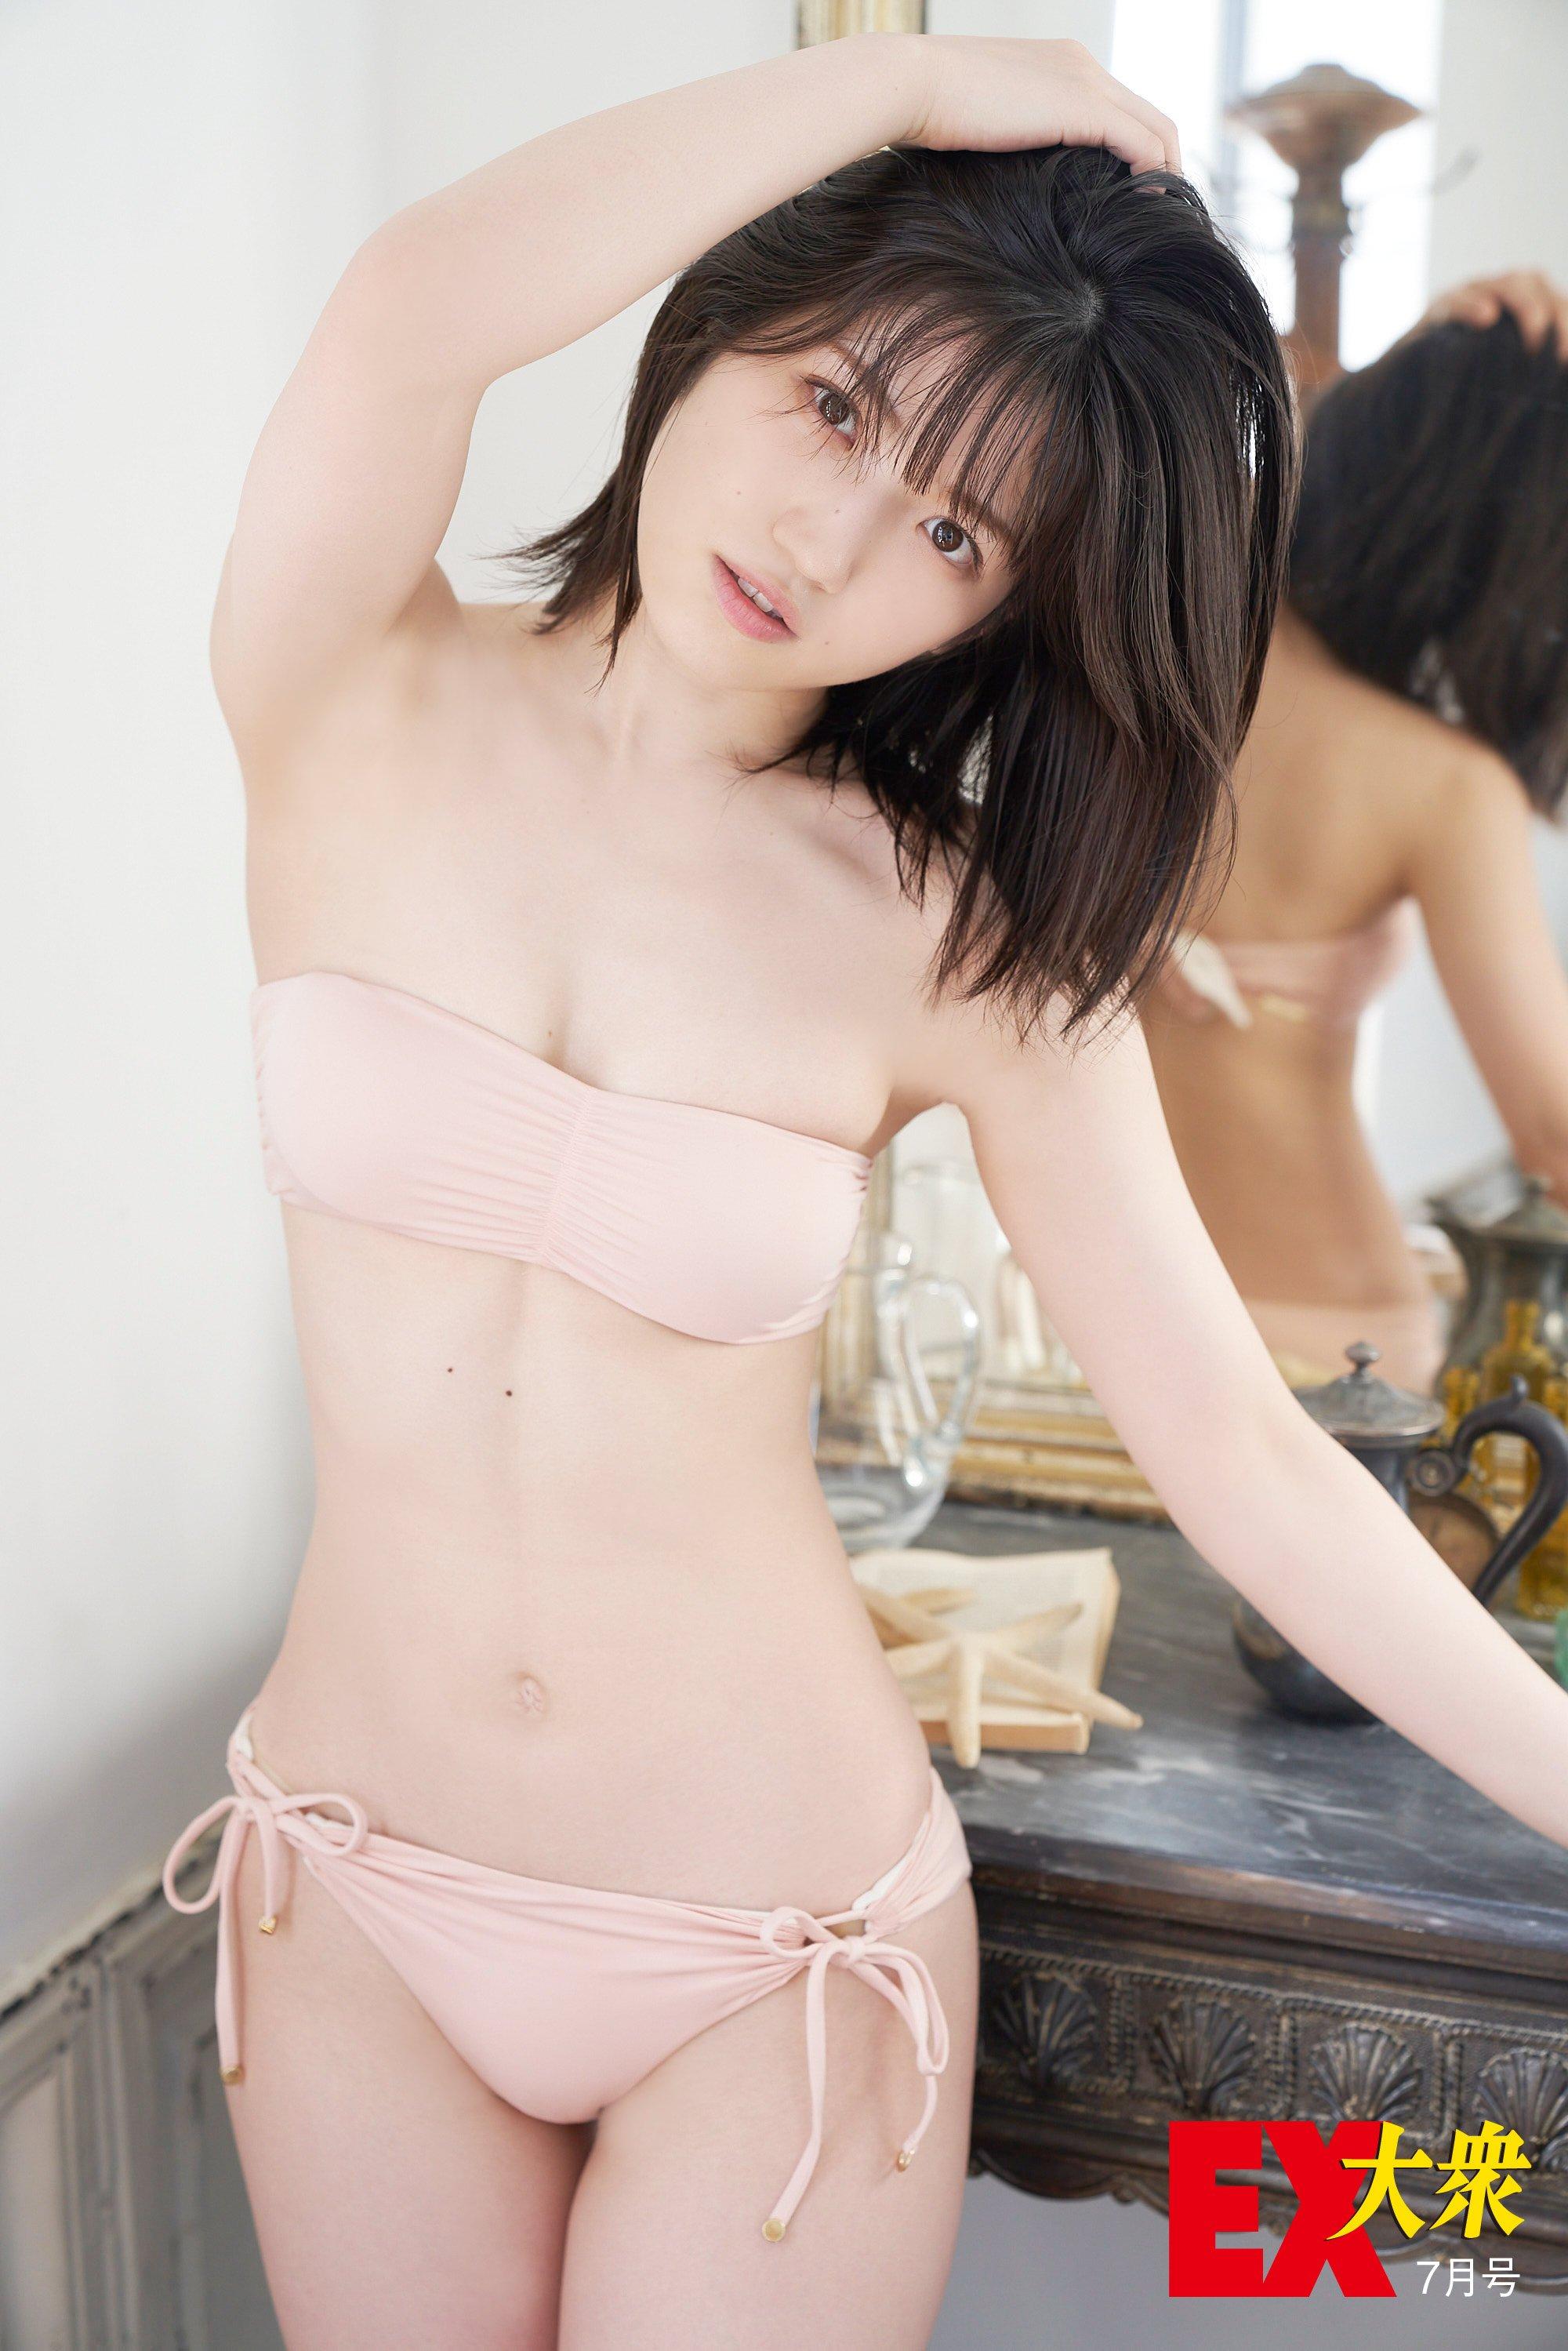 AKB48村山彩希の本誌未掲載カット10枚を大公開!【EX大衆7月号】の画像009